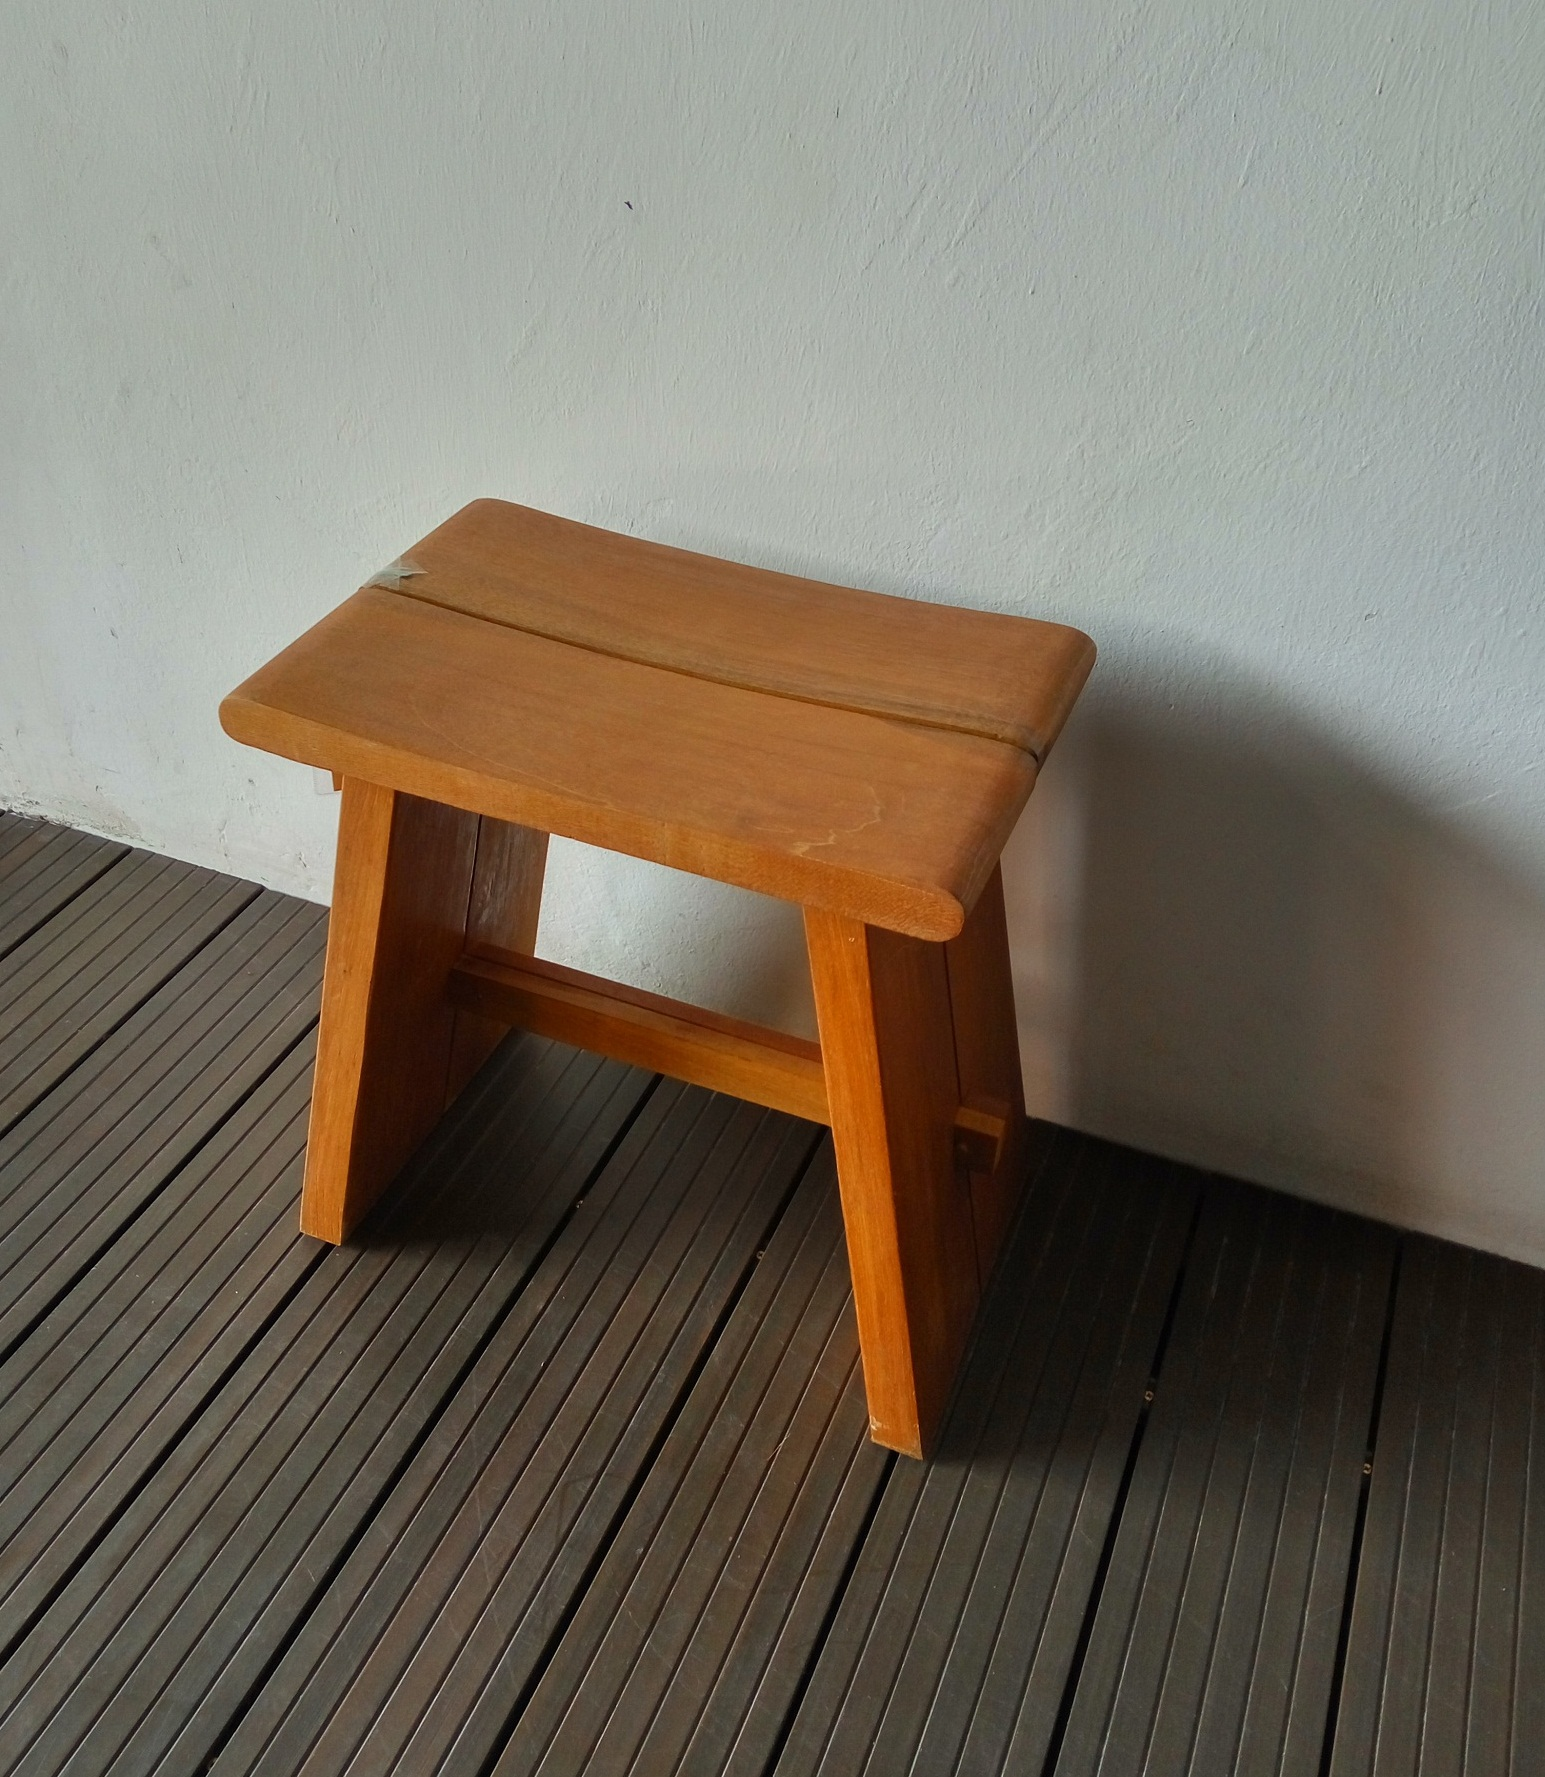 Designer Stool Balau Designer Furniture Balau Furniture